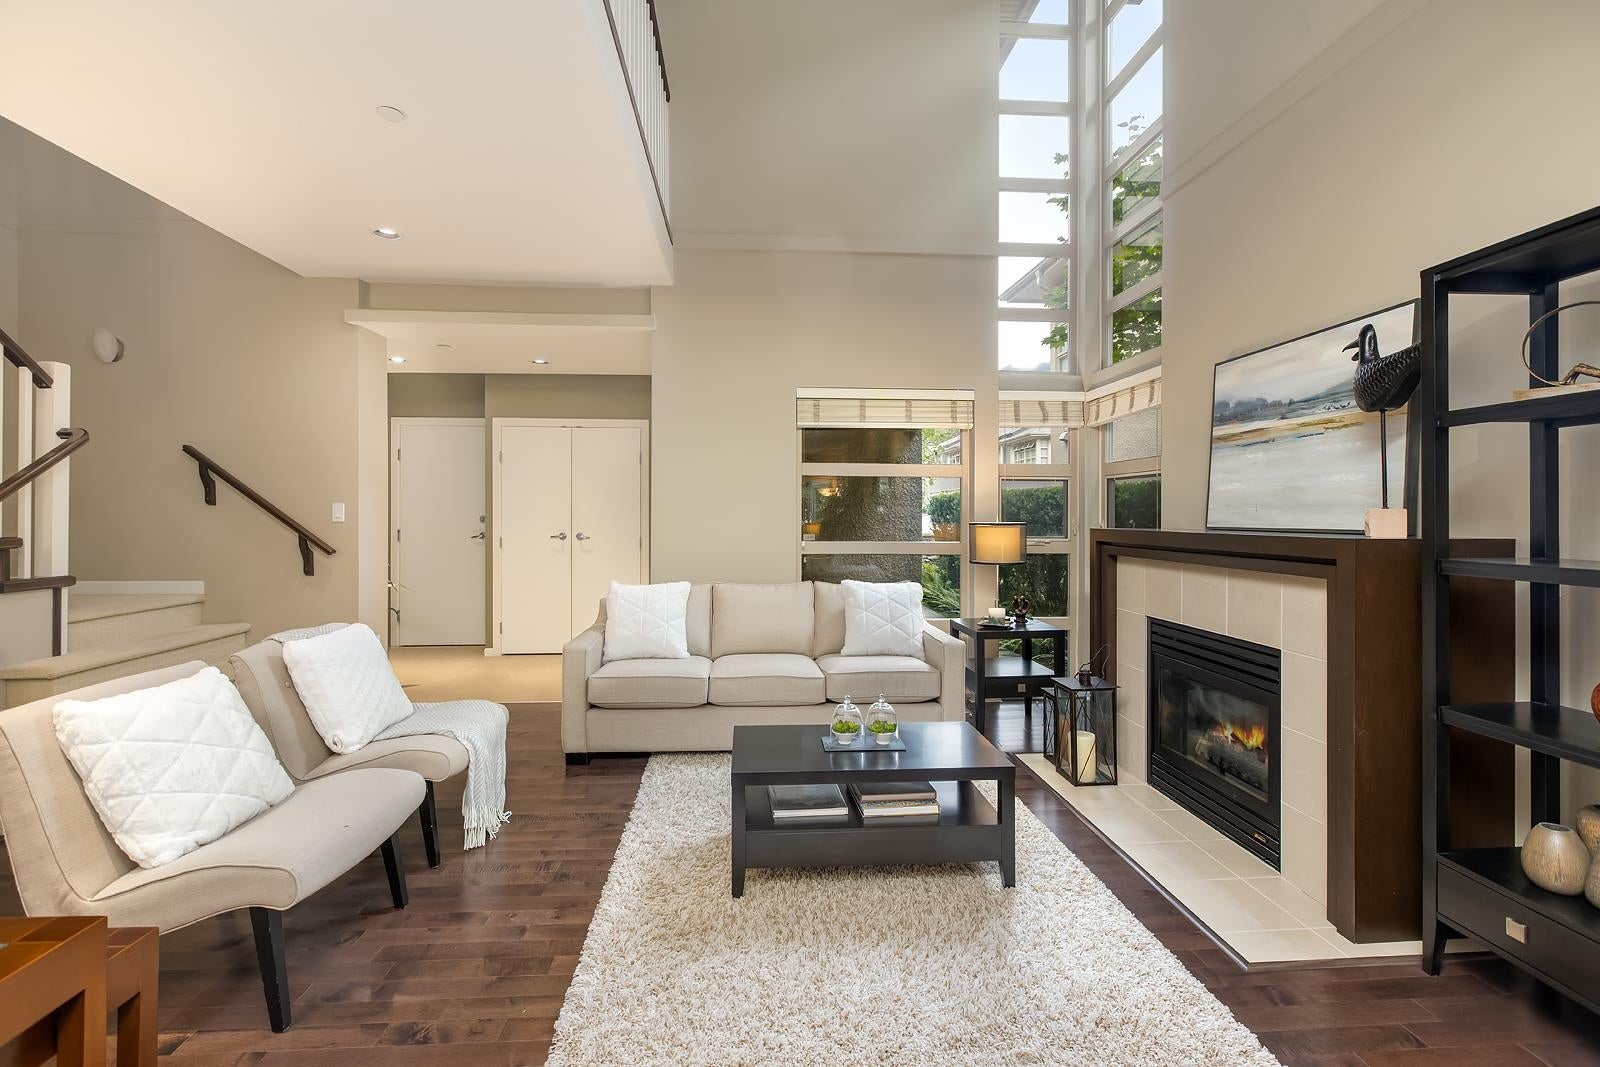 6 3750 EDGEMONT BOULEVARD - Edgemont Townhouse for sale, 4 Bedrooms (R2617117) - #4